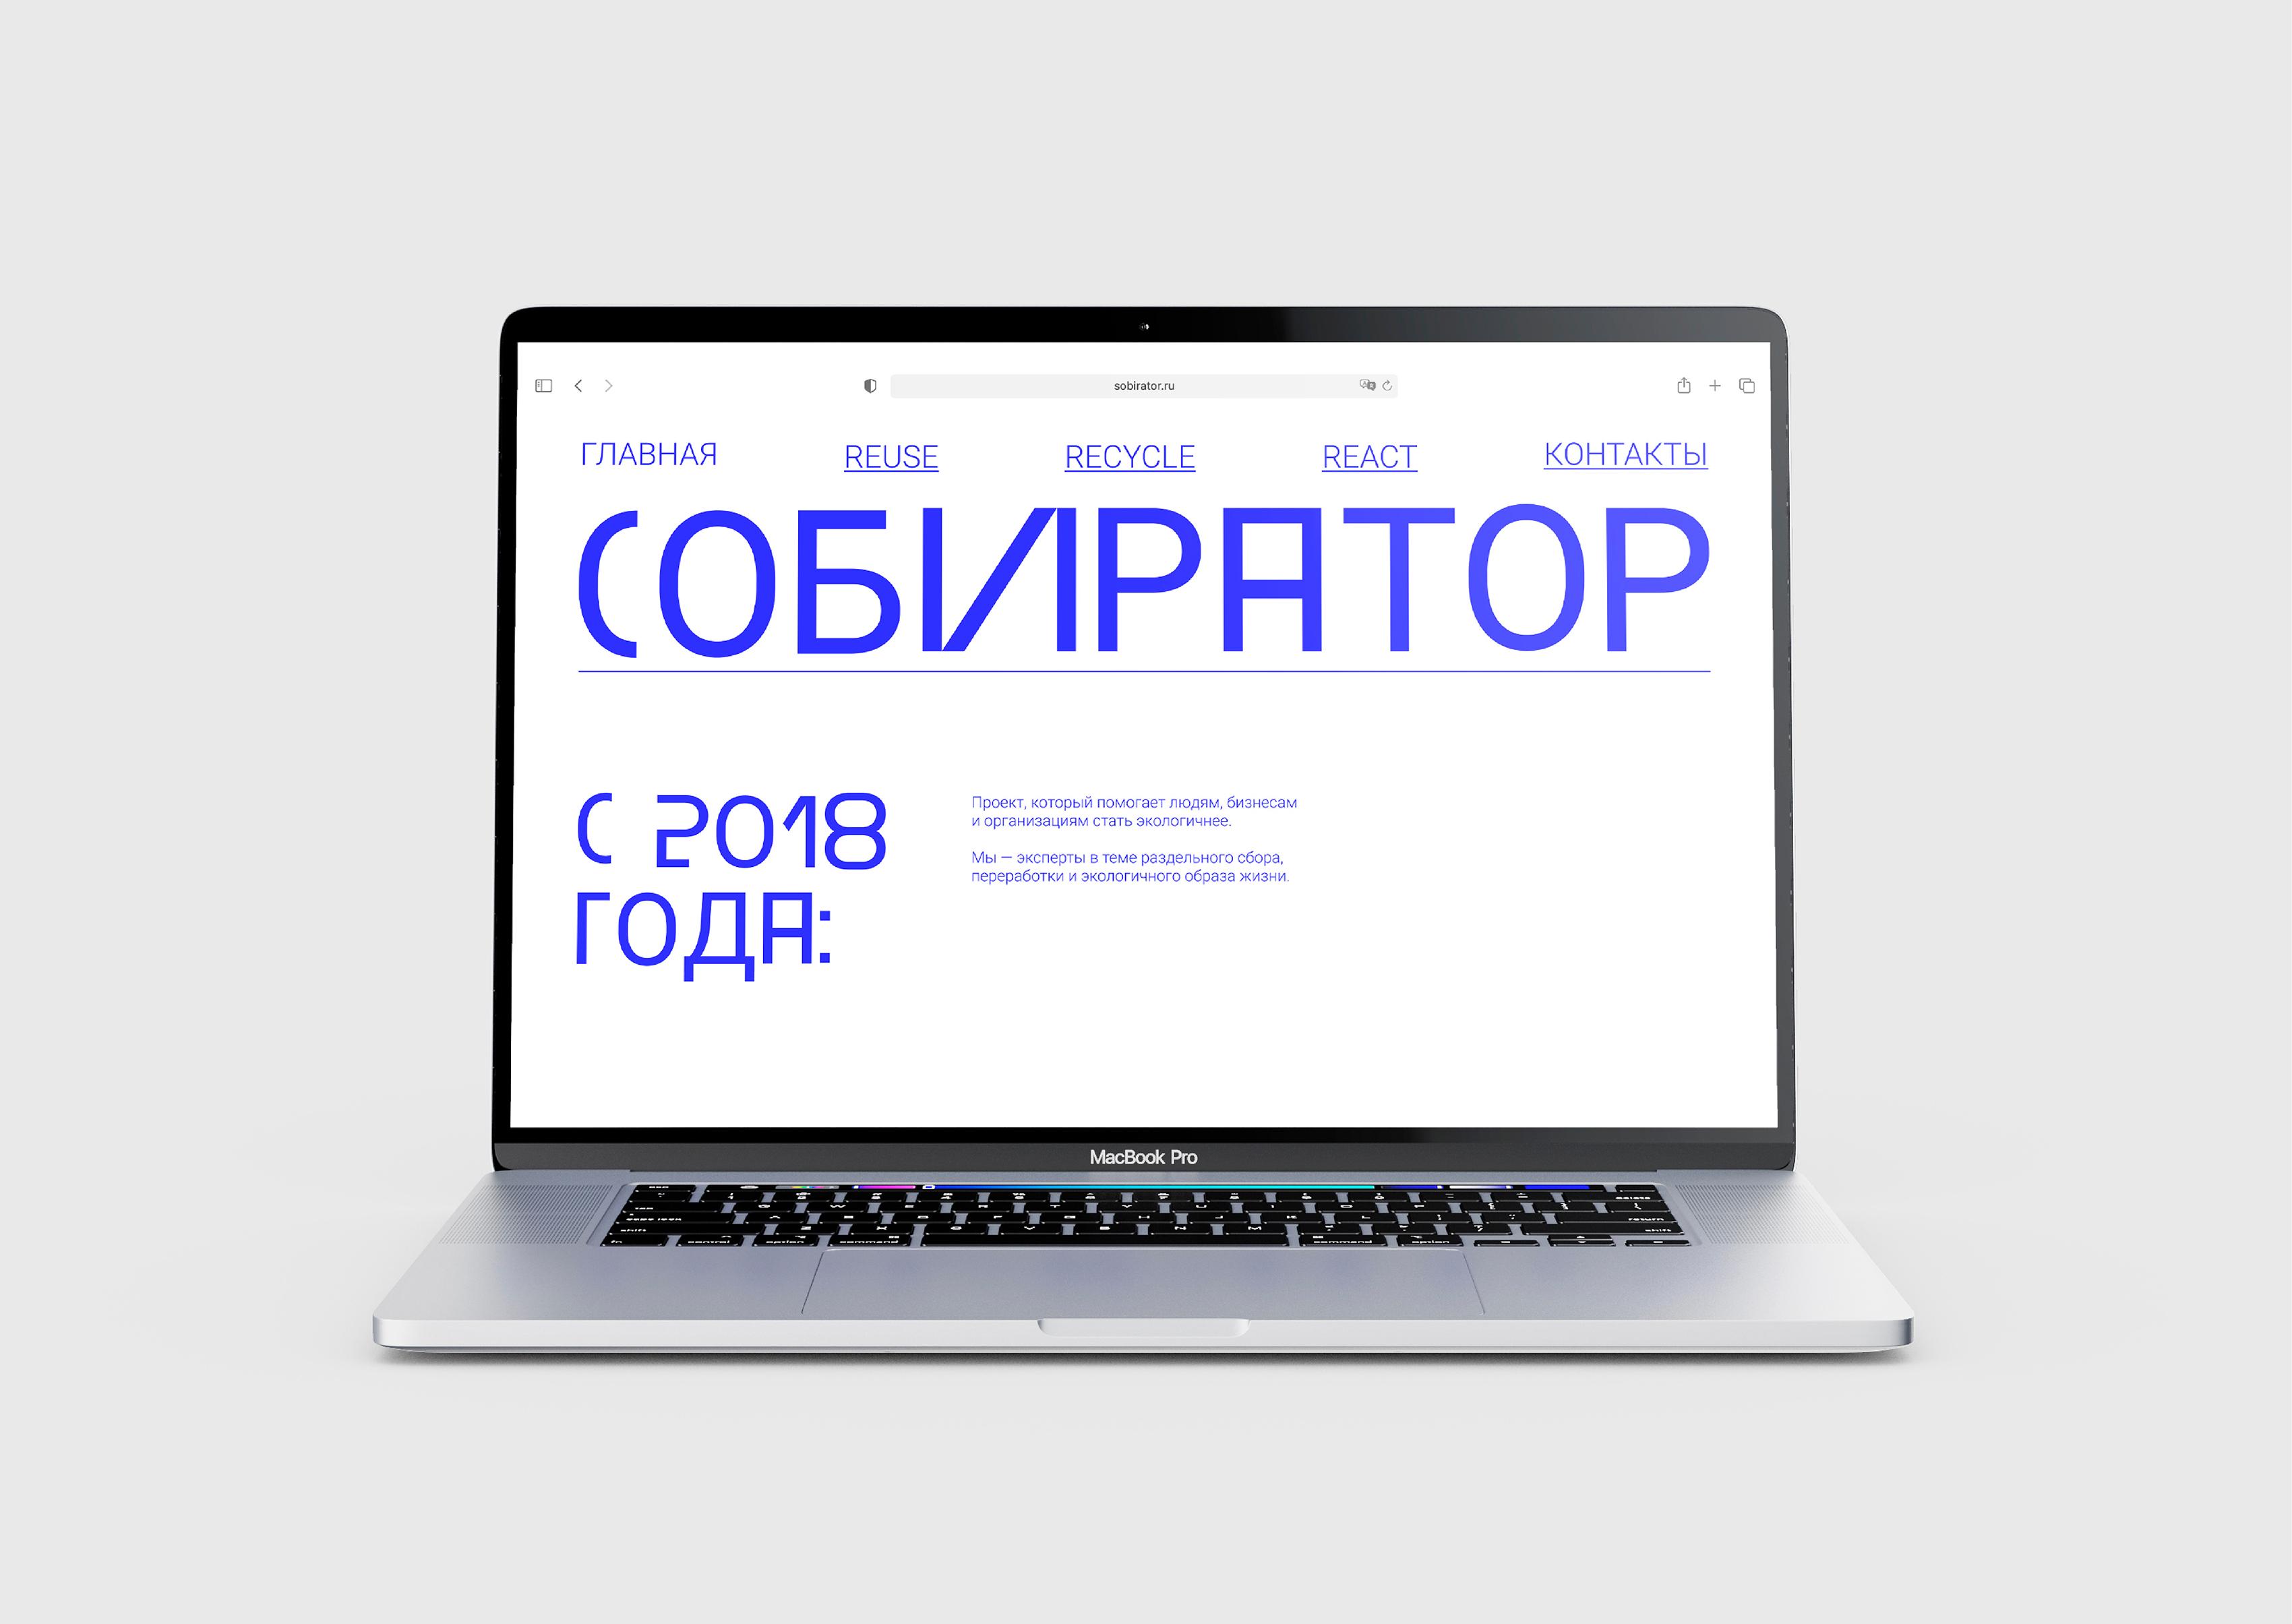 Recycling Company Sobirator Student Branding Concept by Eltsik Pogosyan